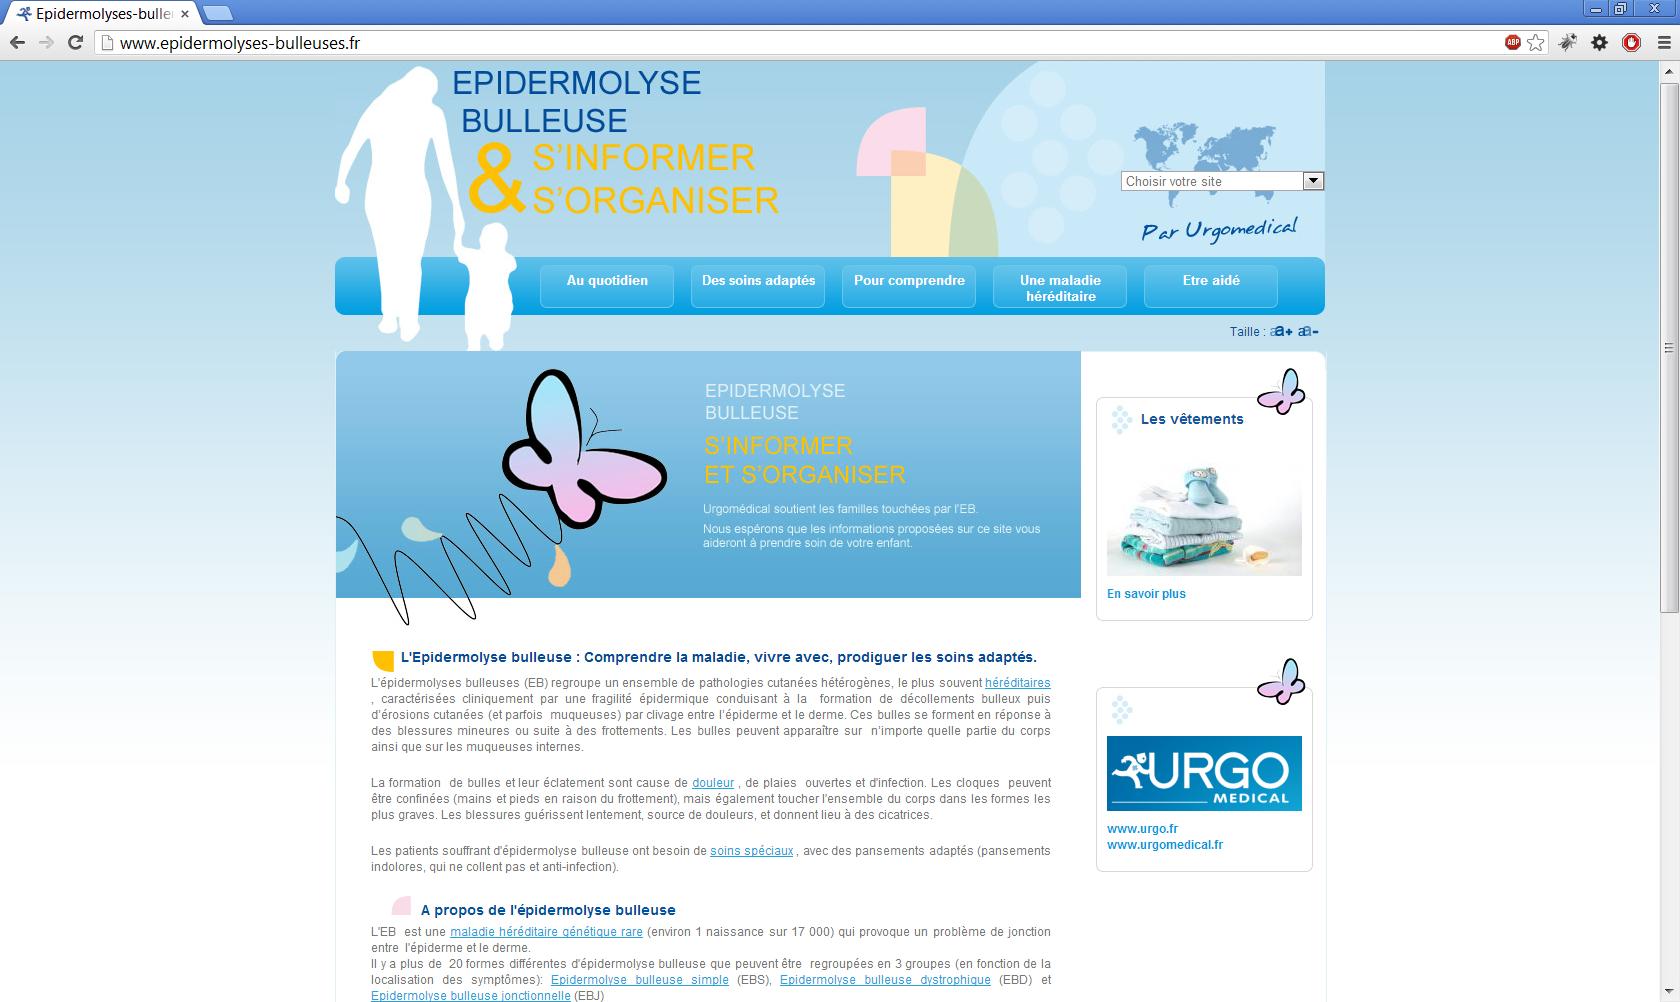 www.epidermolyses-bulleuses.fr